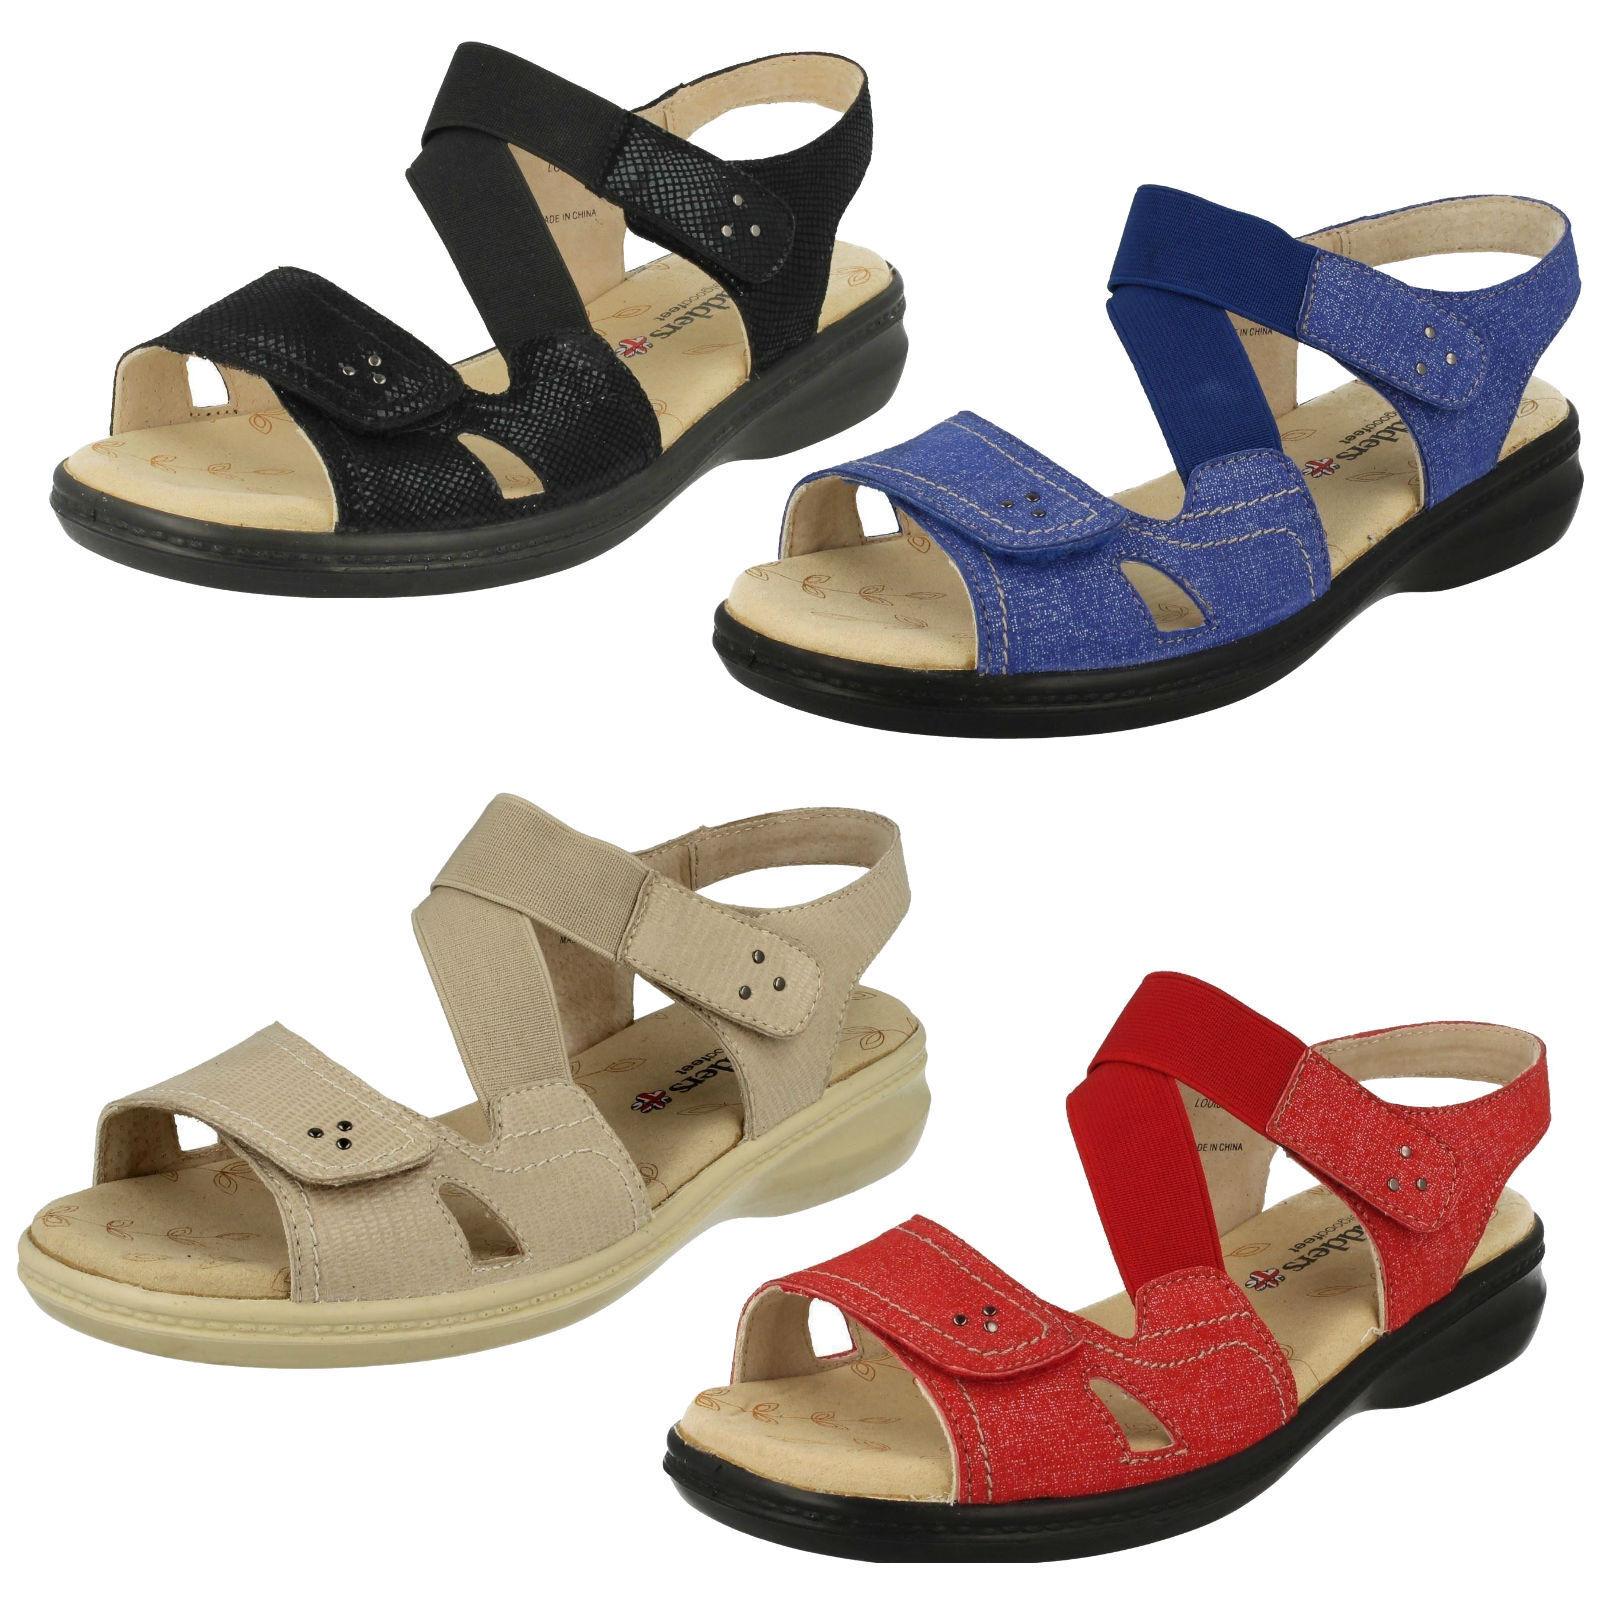 PADDERS LADIES LOUISE 729 OPEN TOE RIPTAPE STRAP WIDE FIT SANDALS Schuhe